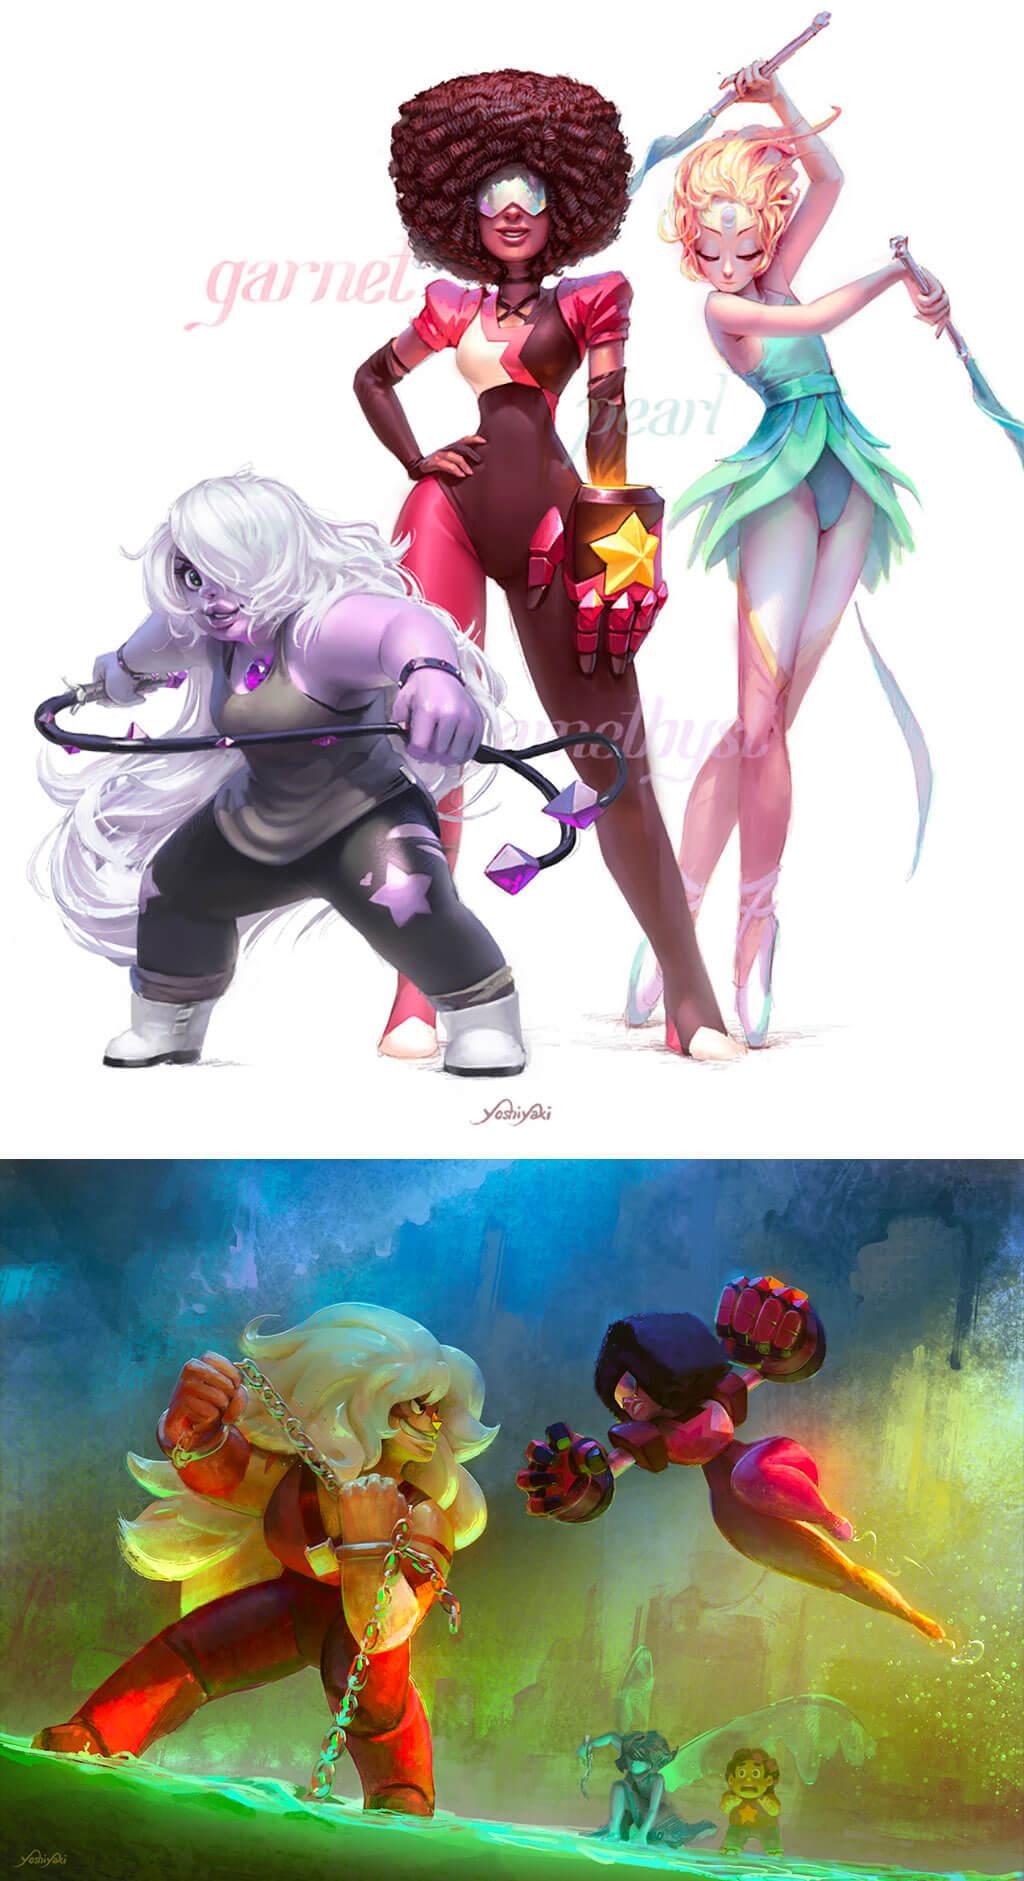 Steven Universe Fan Art by Cassio Yoshiyaki